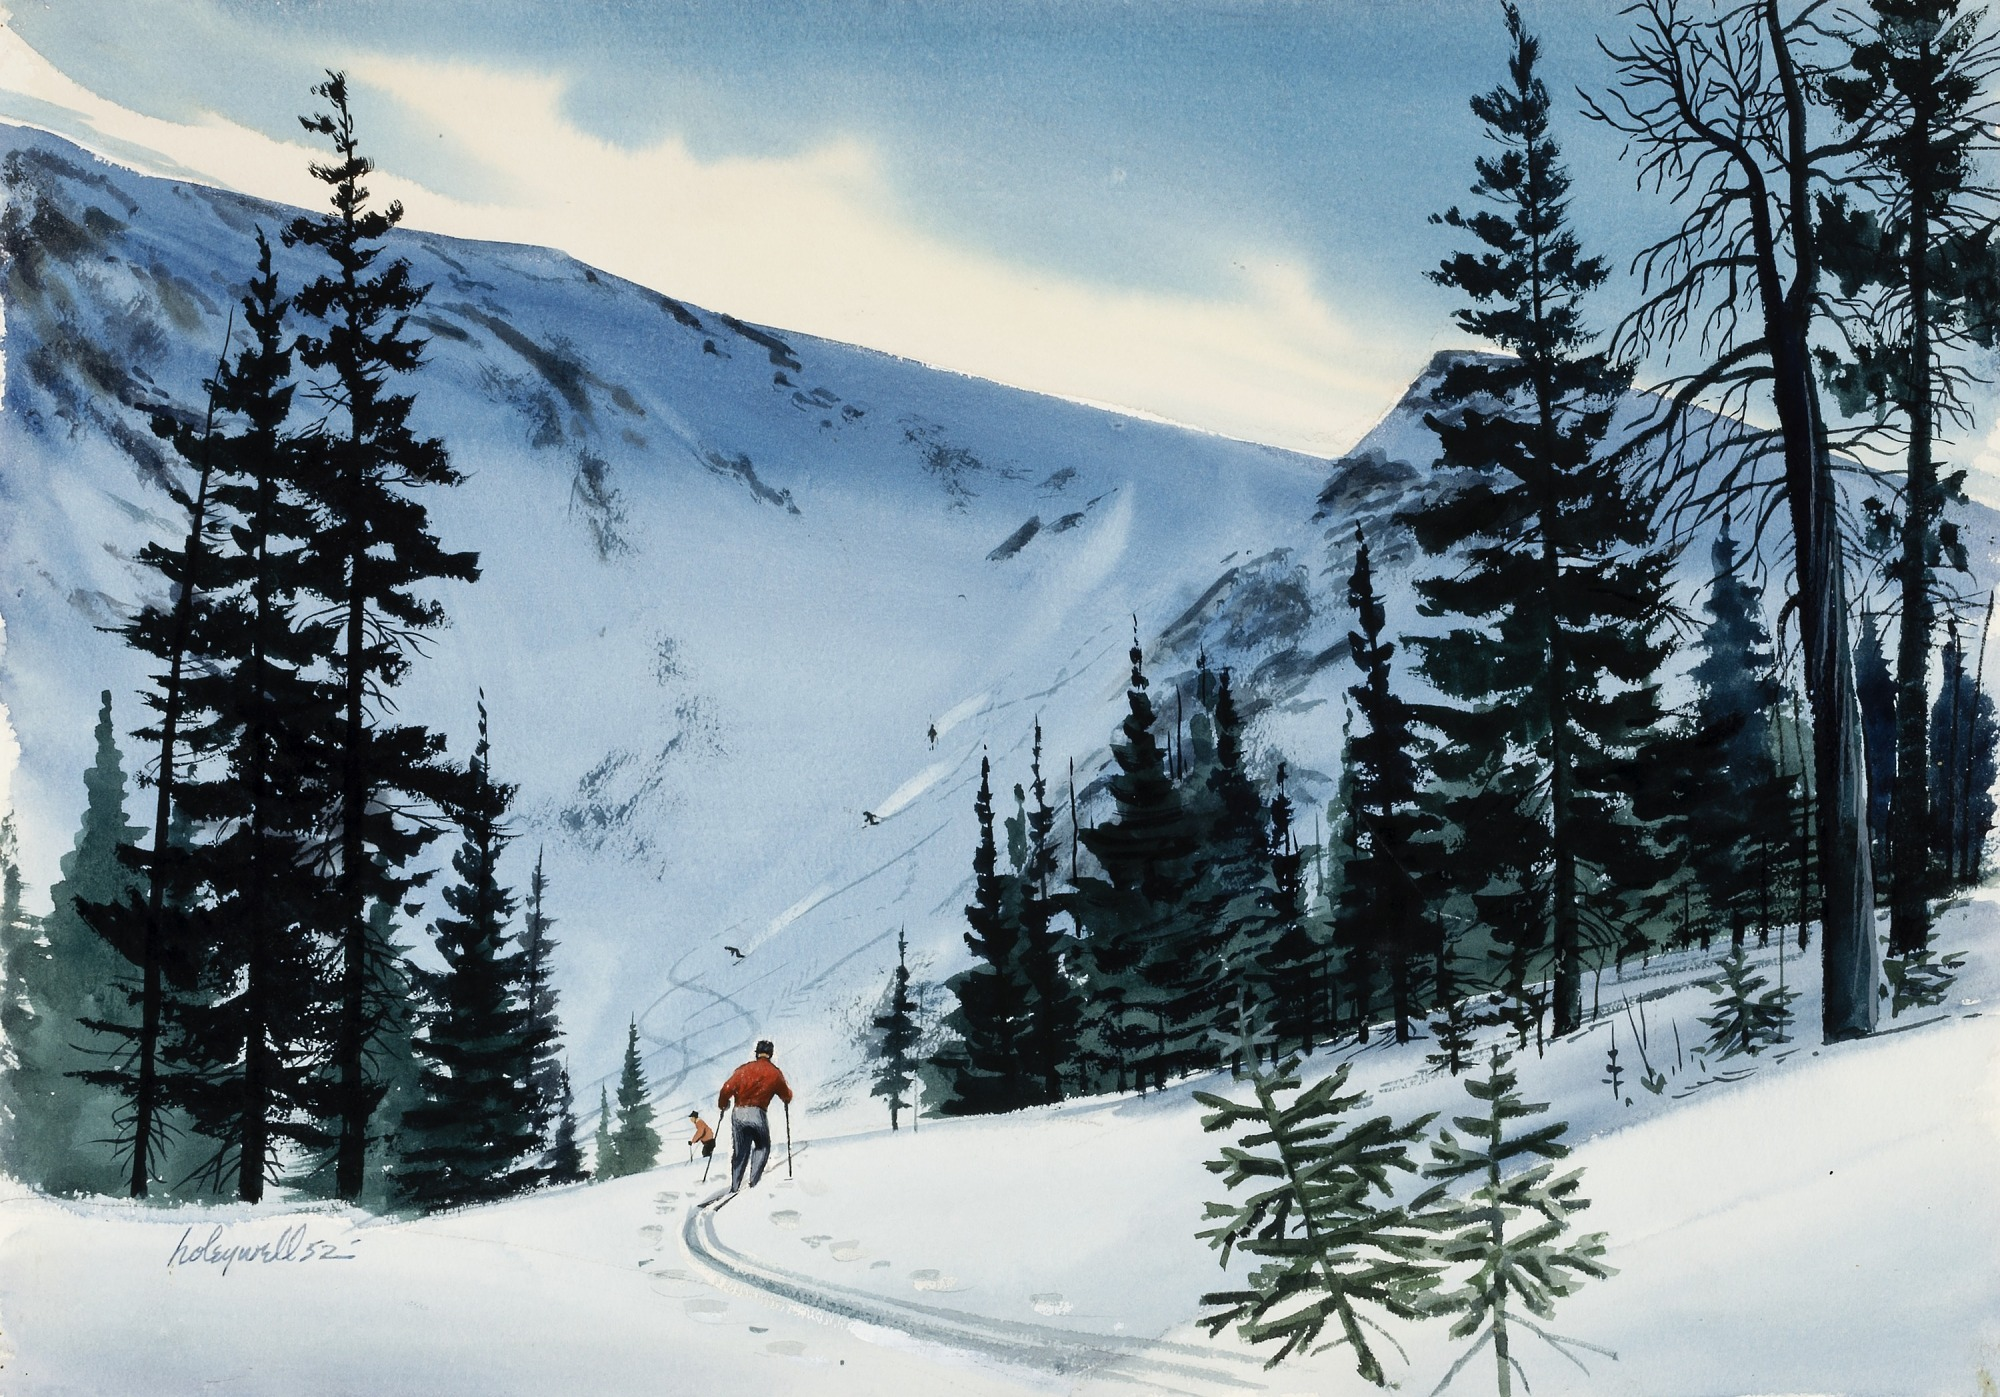 images for Skiing at Tuckerman's Ravine, Mt. Washington, N. H.